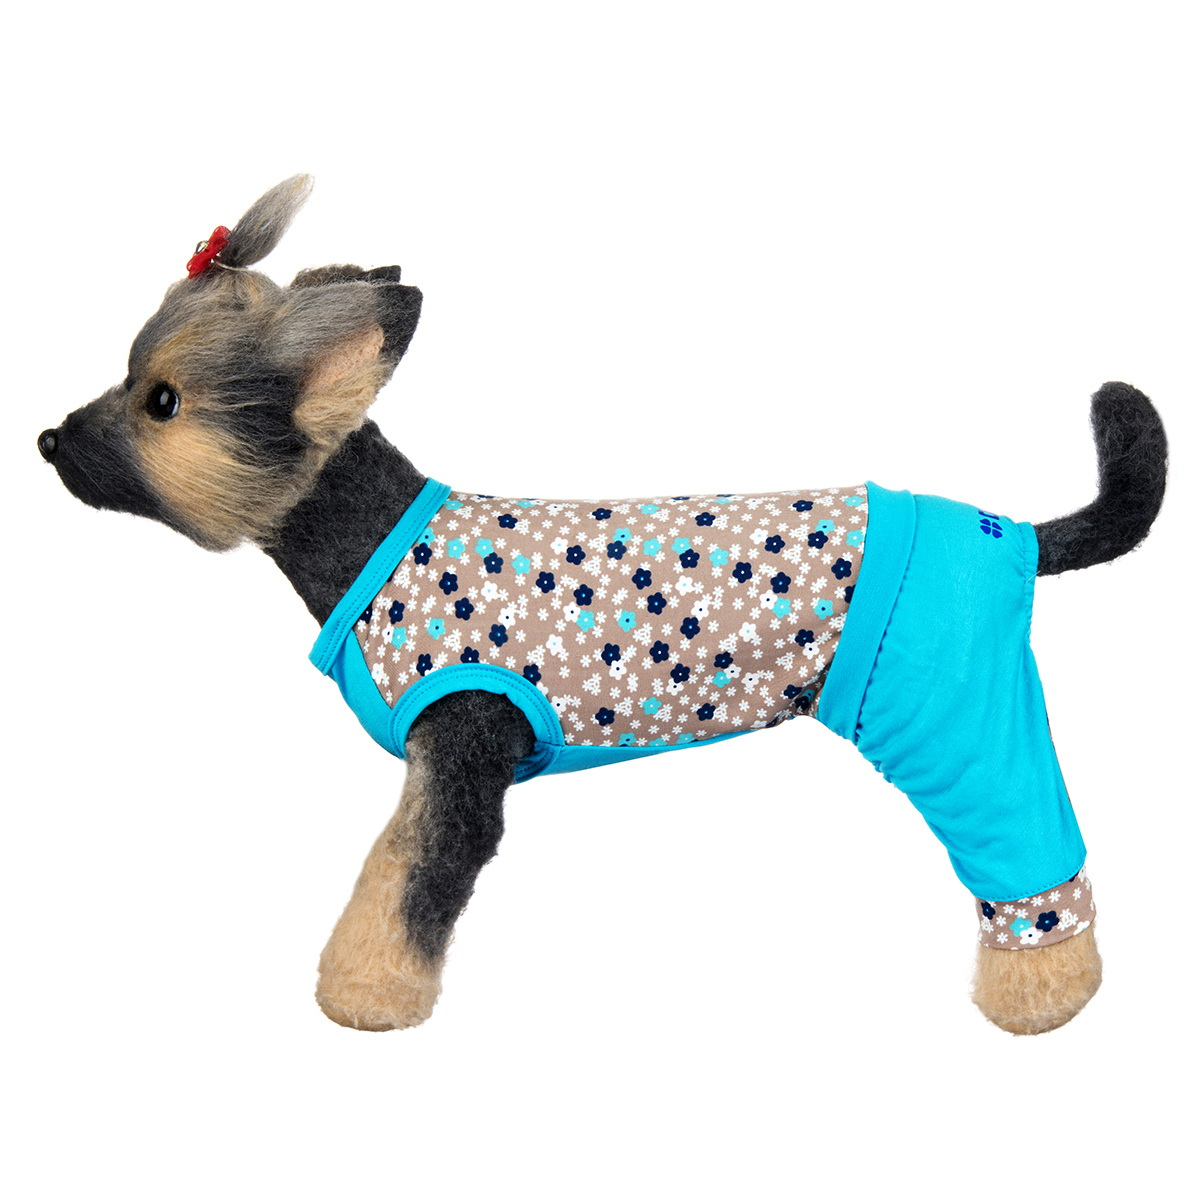 "Комбинезон для собак Dogmoda ""Алекс"", унисекс, цвет: голубой, серый. Размер 4 (XL)"